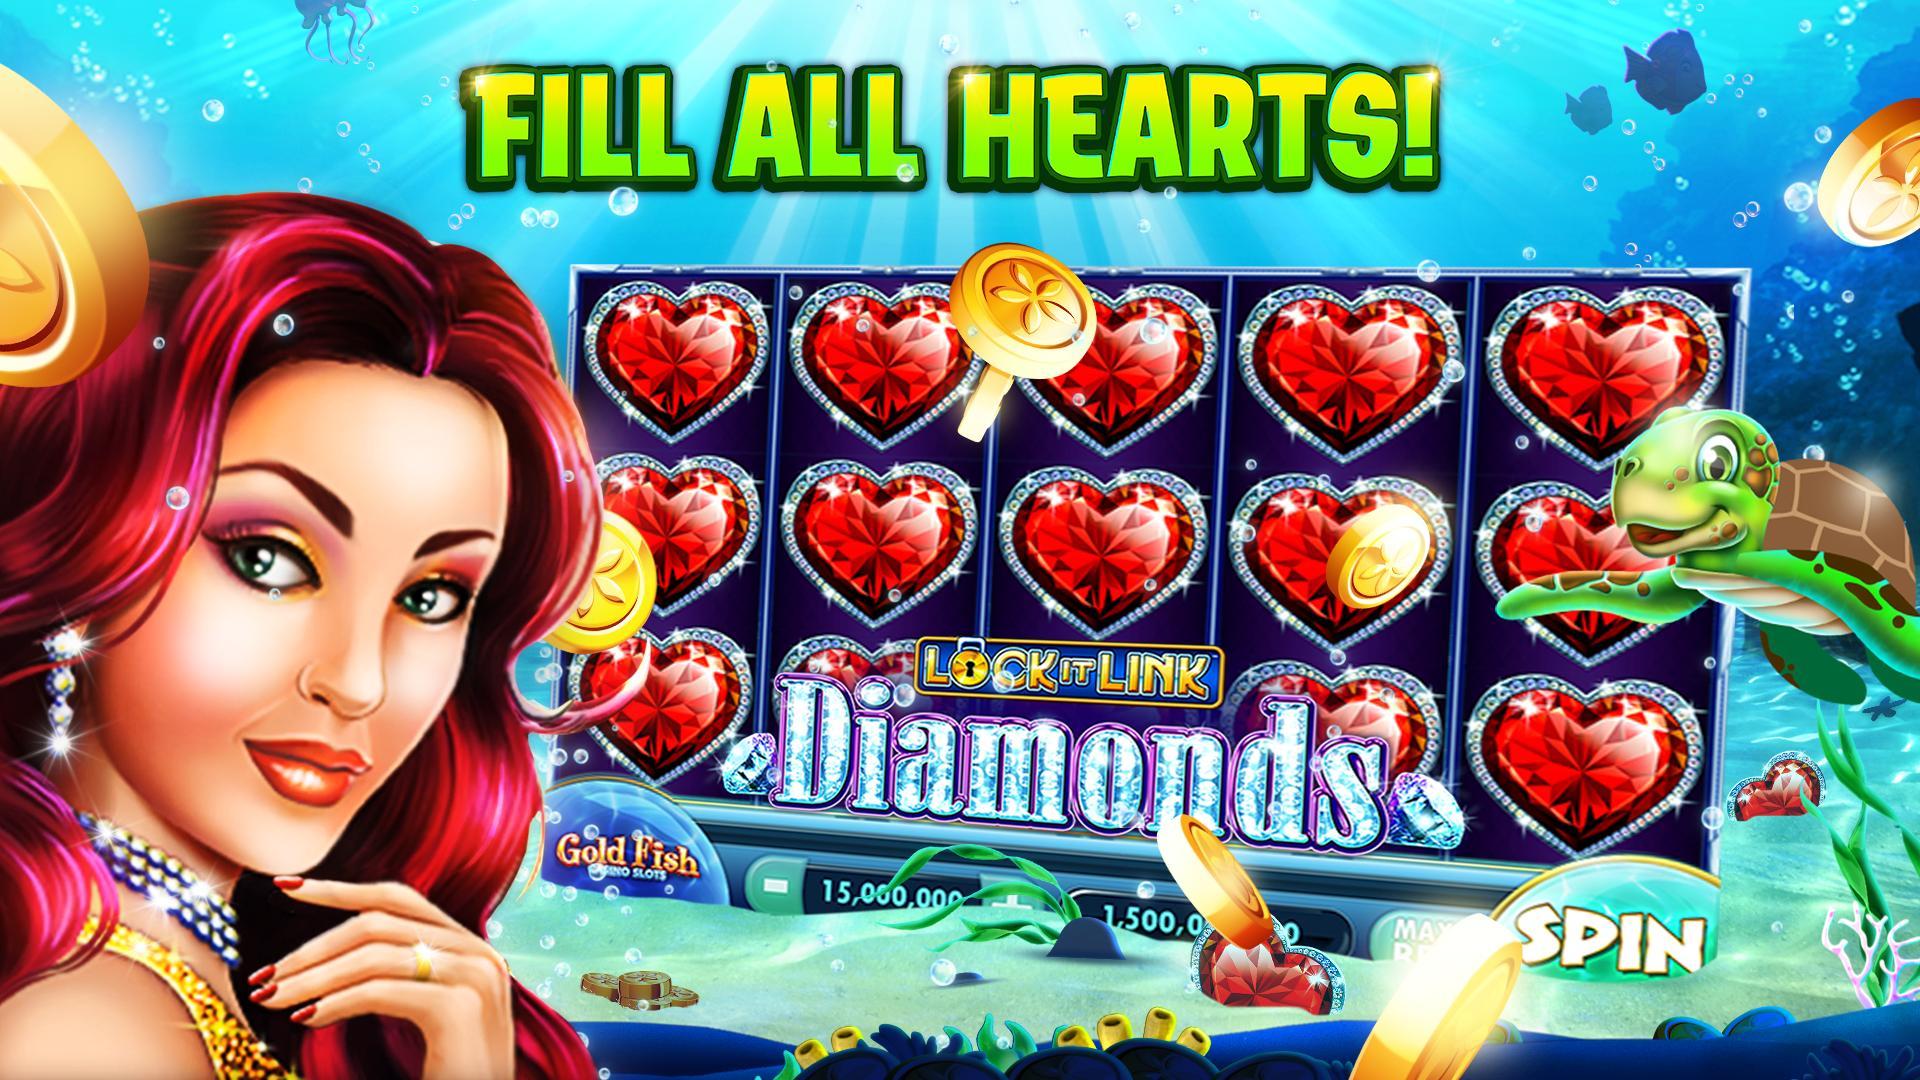 Gold Fish Casino Slots - FREE Slot Machine Games 25.09.00 Screenshot 8